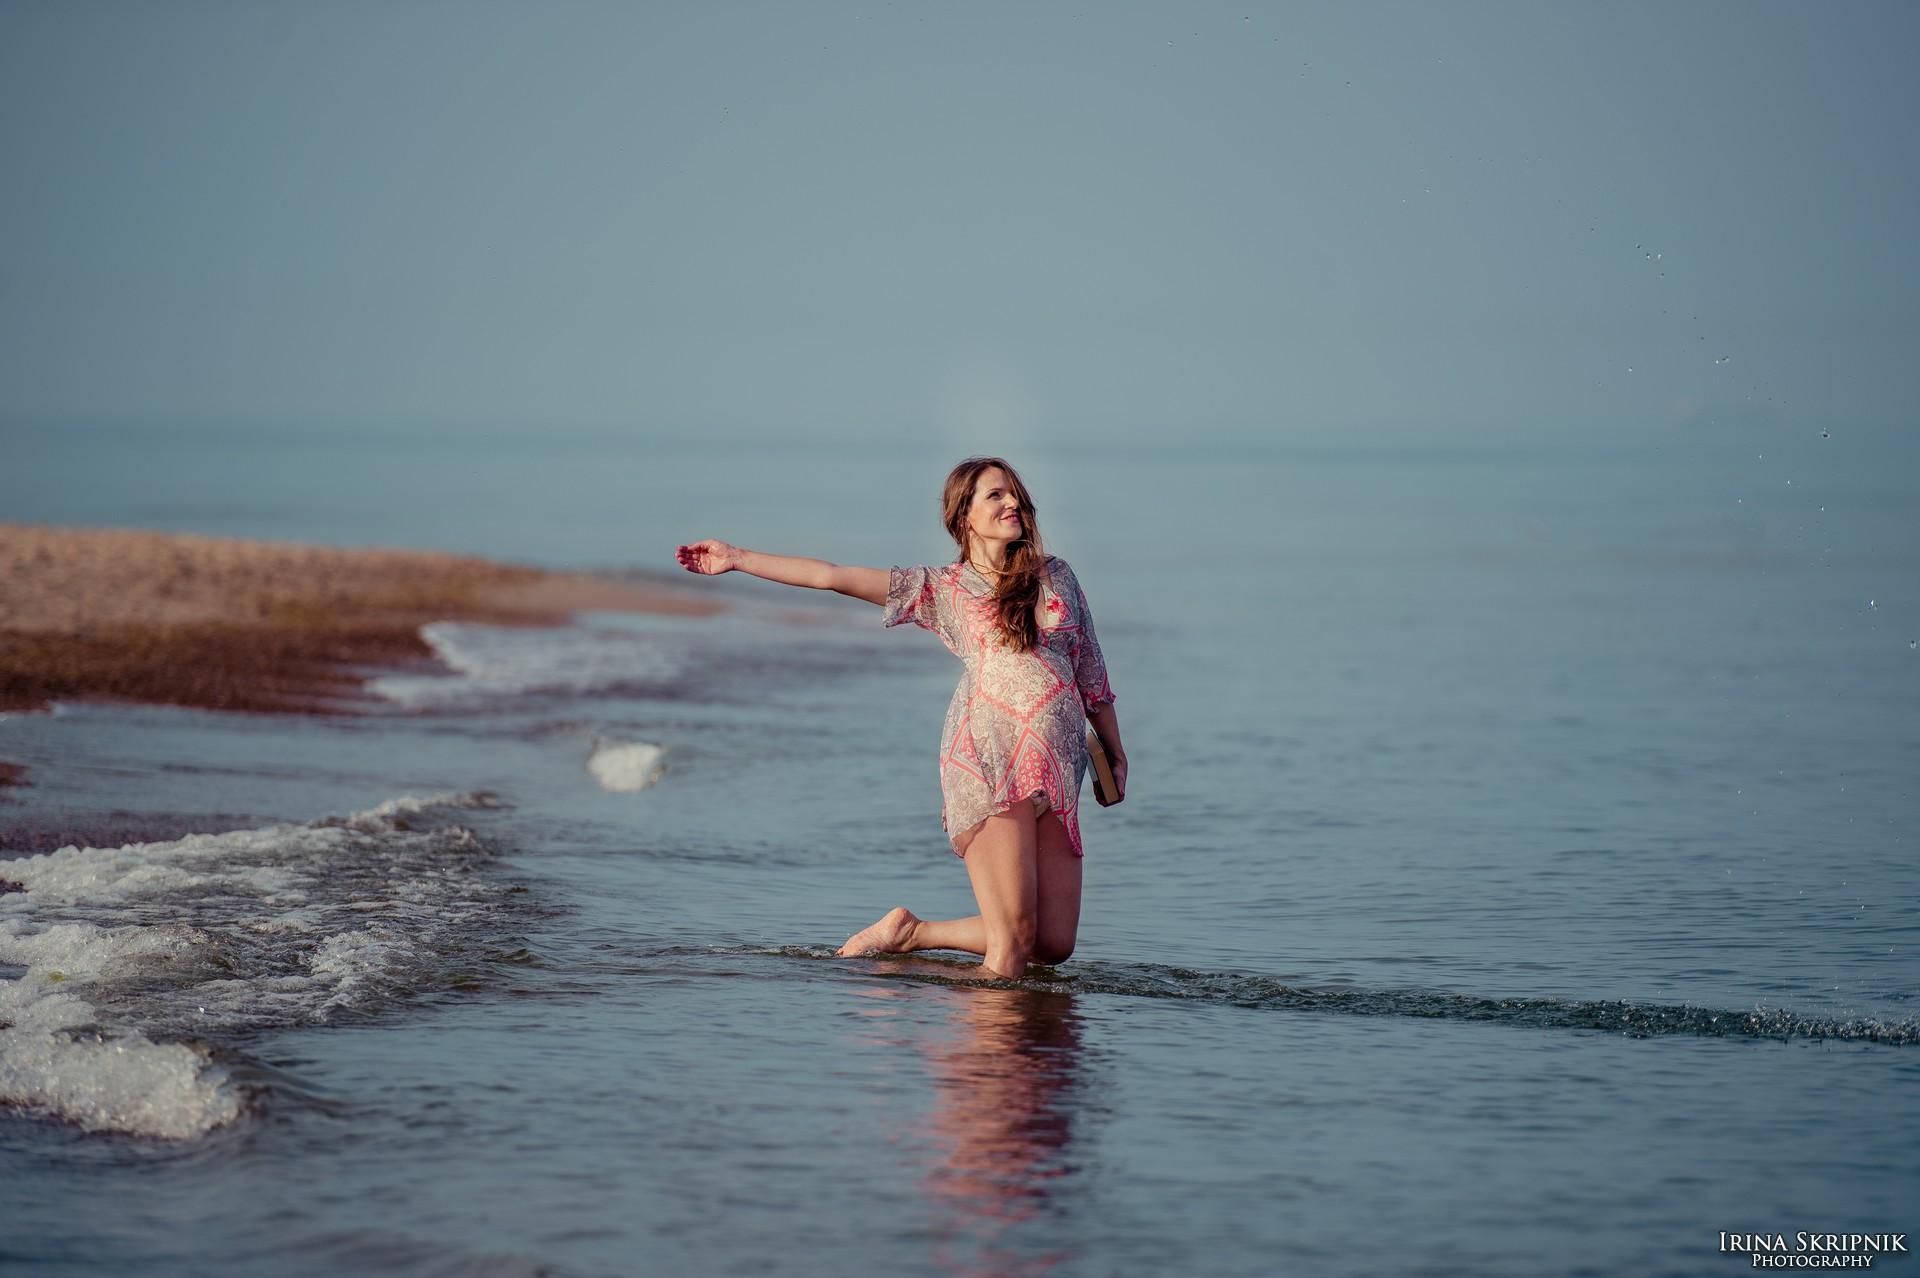 Irina Skripnik Photography 10079